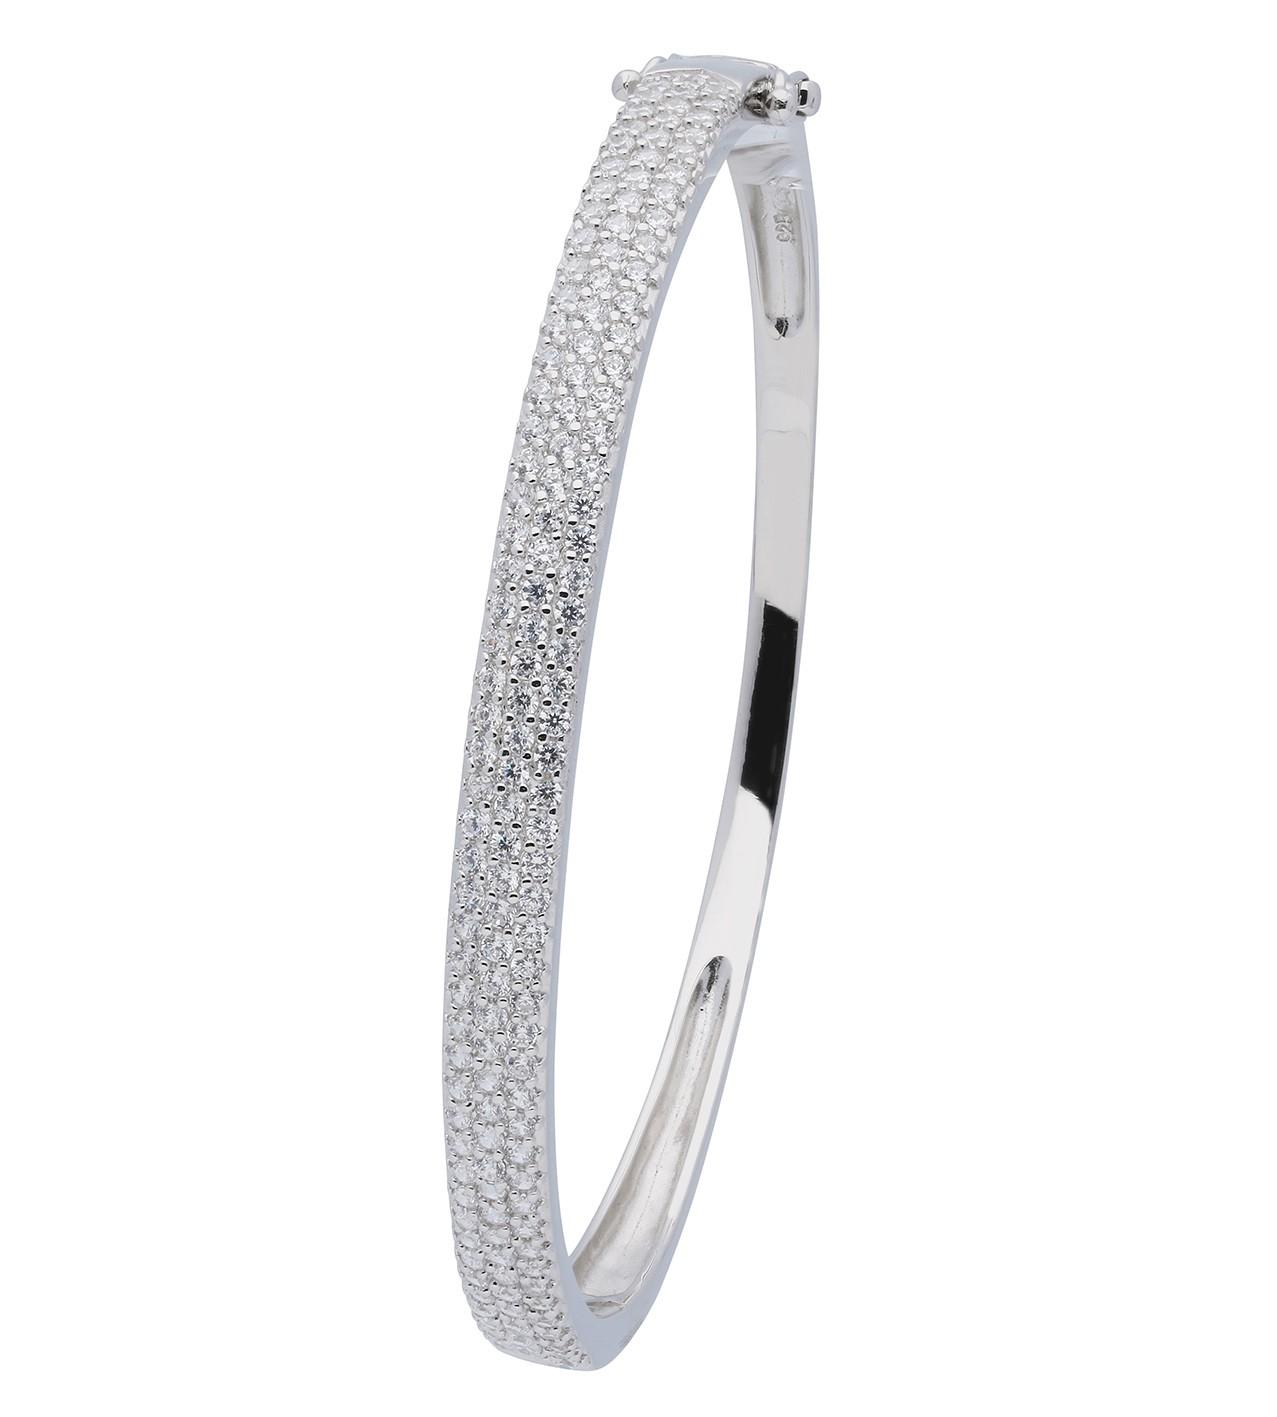 Classics Zilveren Slavenband Zirkonia 4 mm breed vierkant